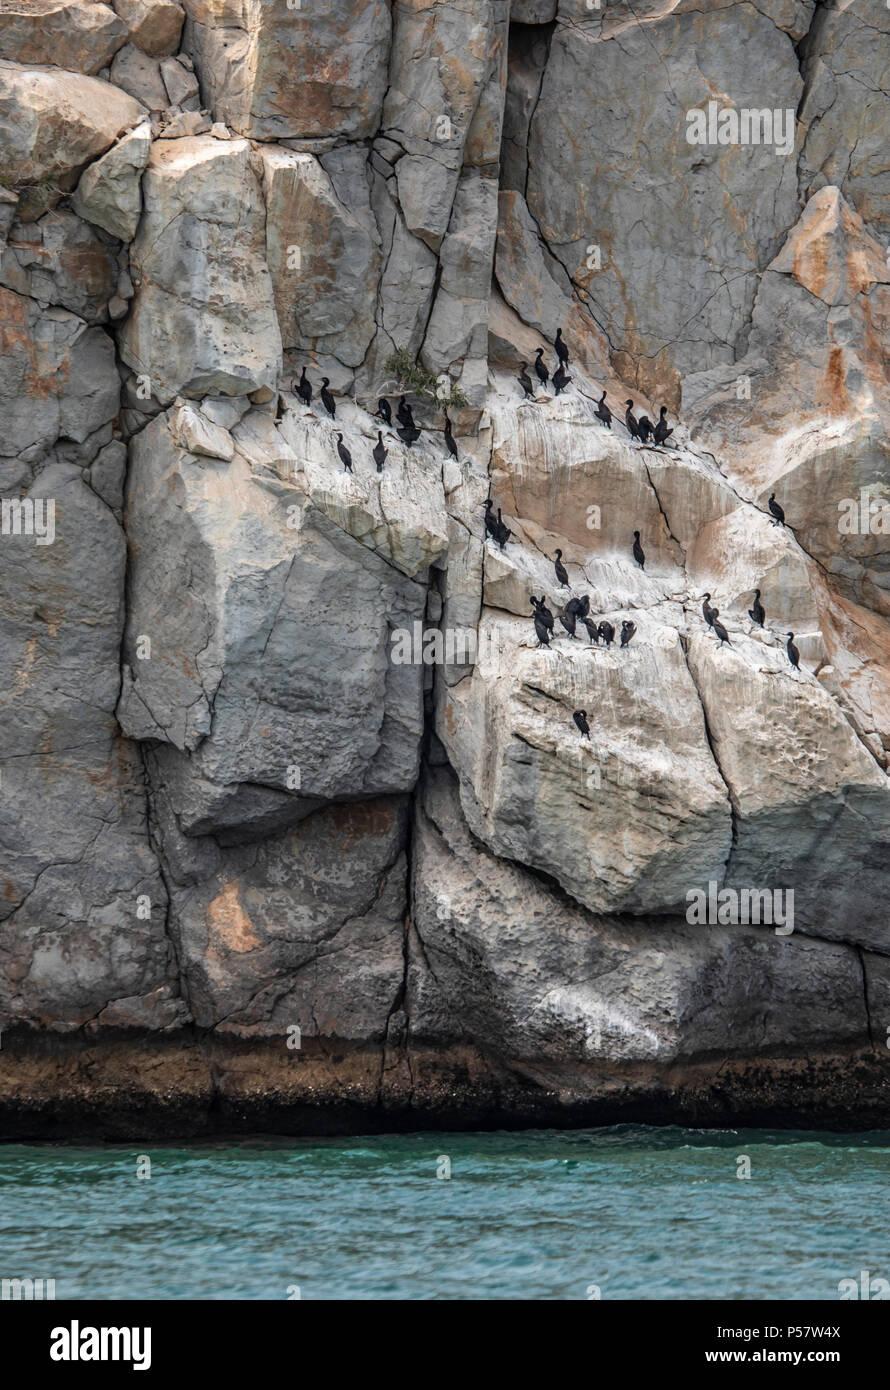 cormorant birds on a cliff in Musandam in Oman - Stock Image